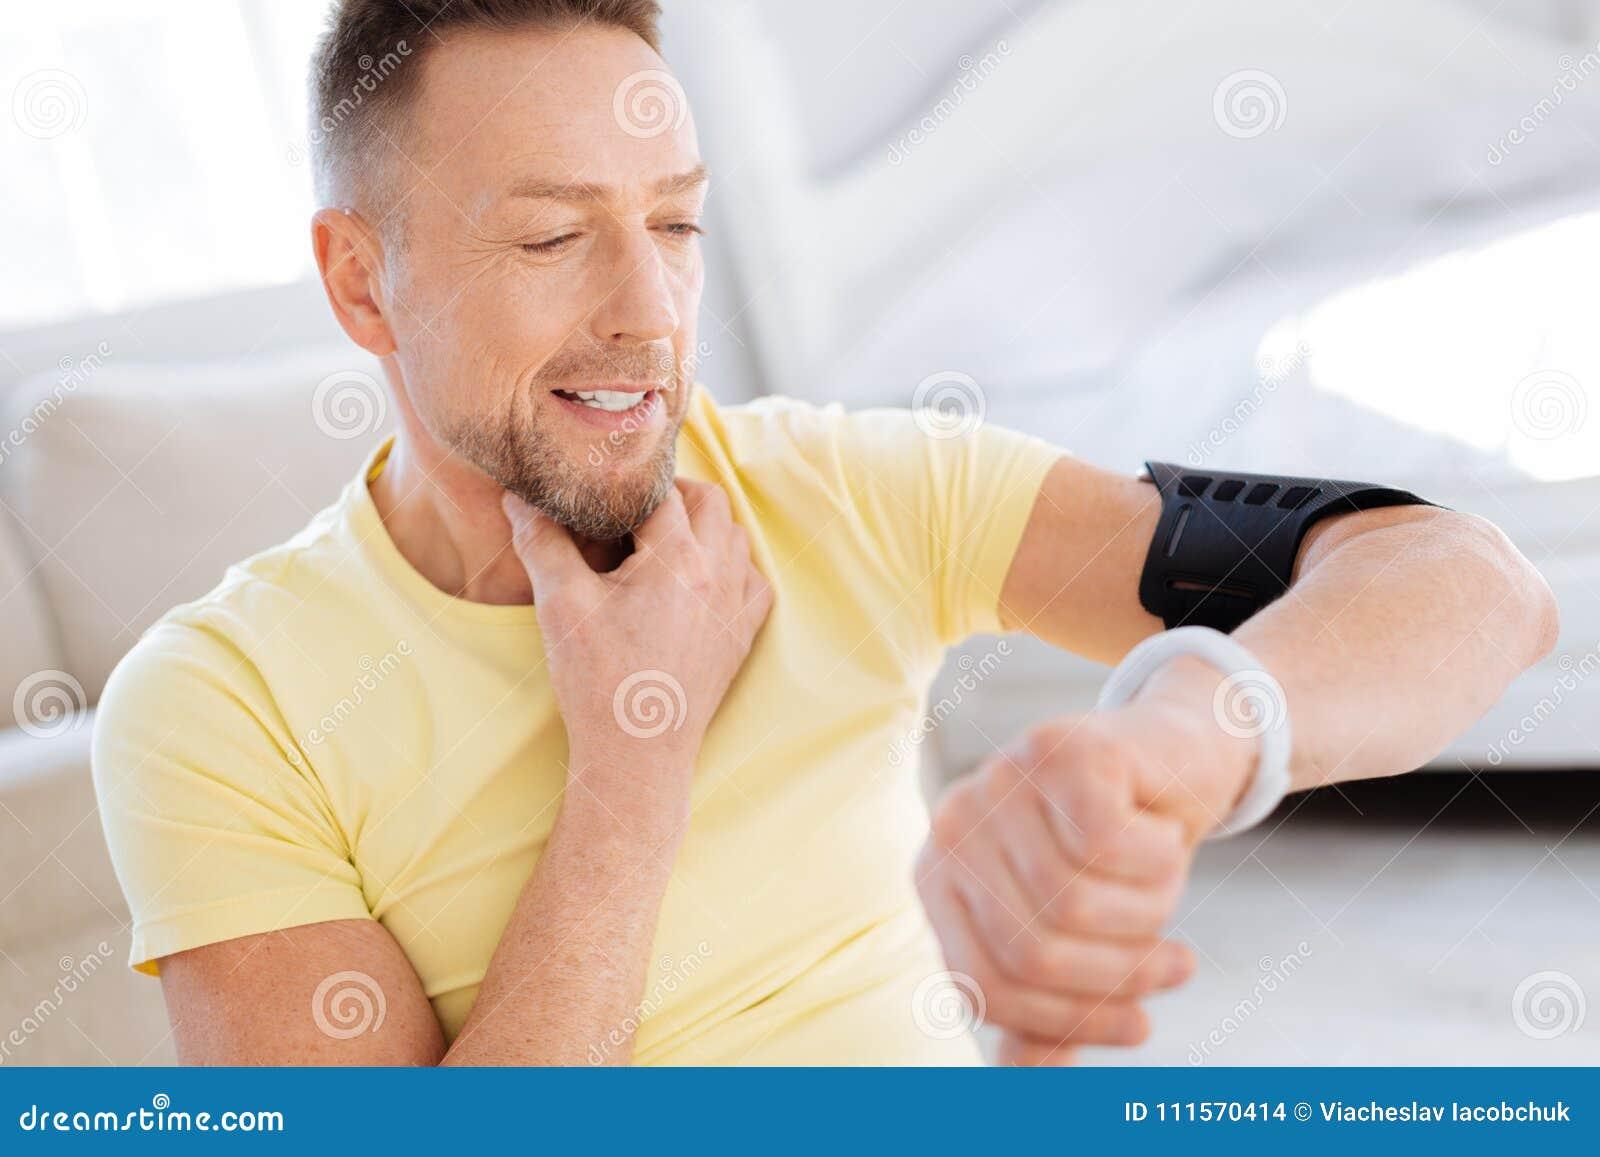 Gay Happy Man Fixing Heart Indicators Stock Photo - Image of